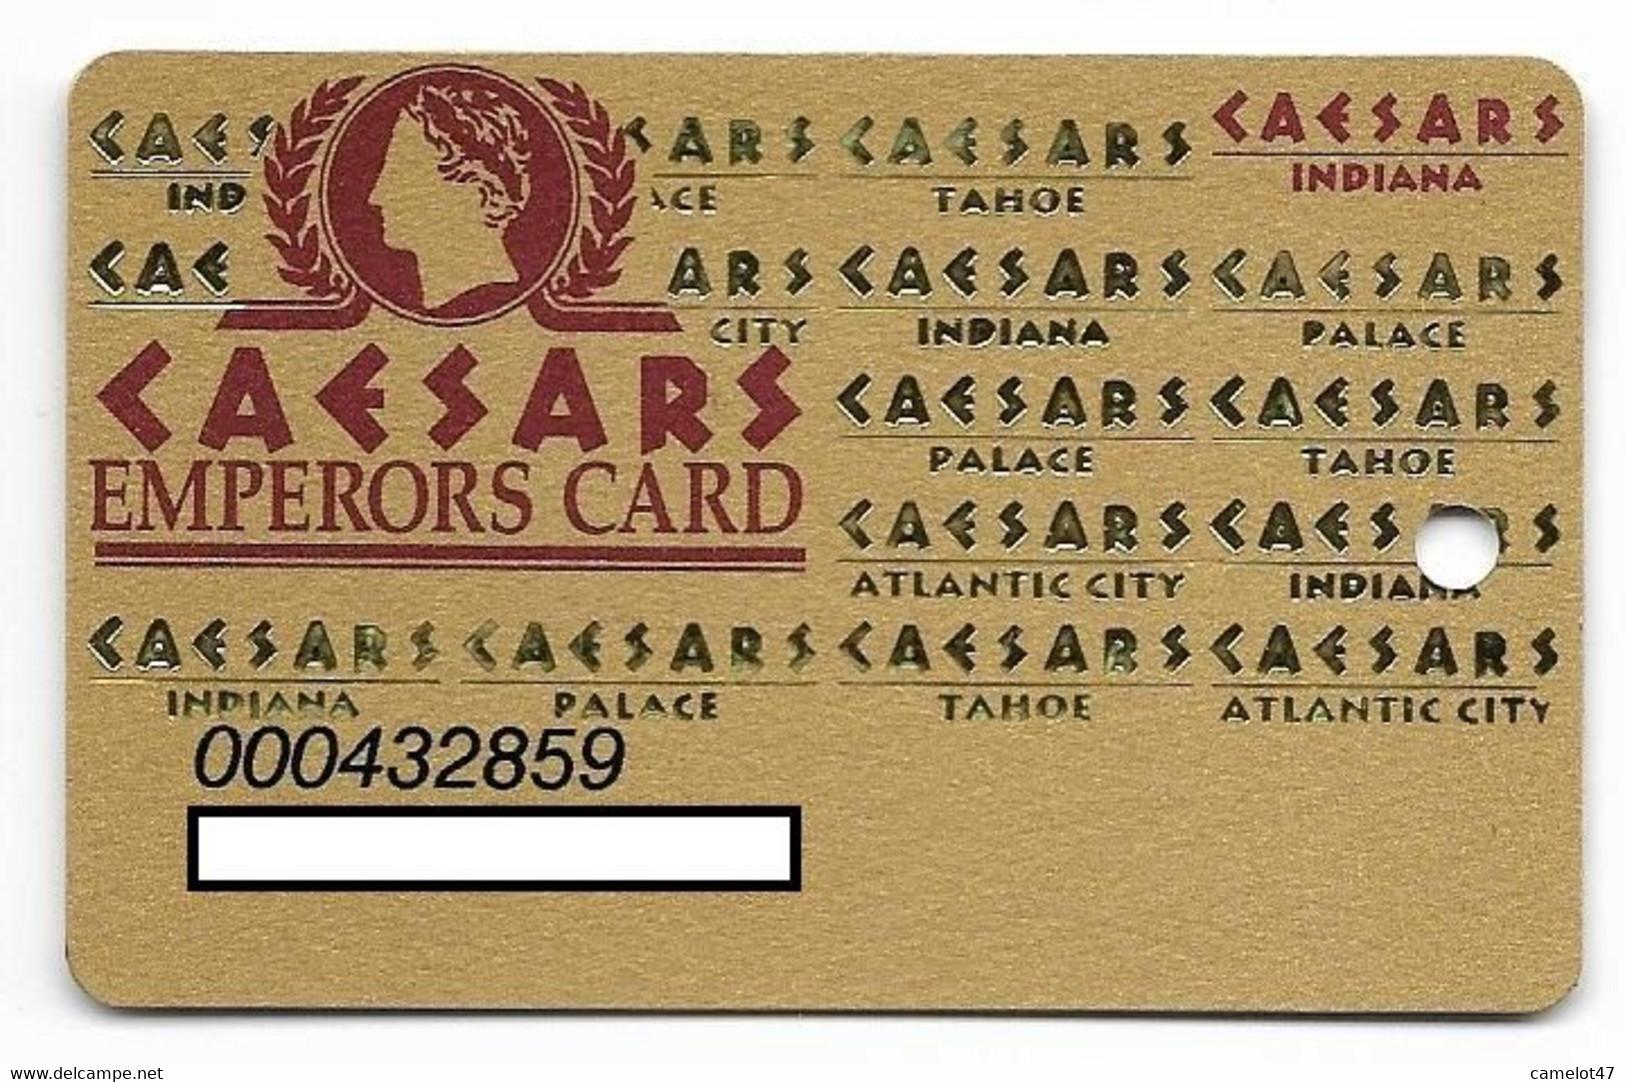 Caesars Palace Casino, Indiana, Older Used Slot Or Player's Card, # Caesars-8 - Casino Cards